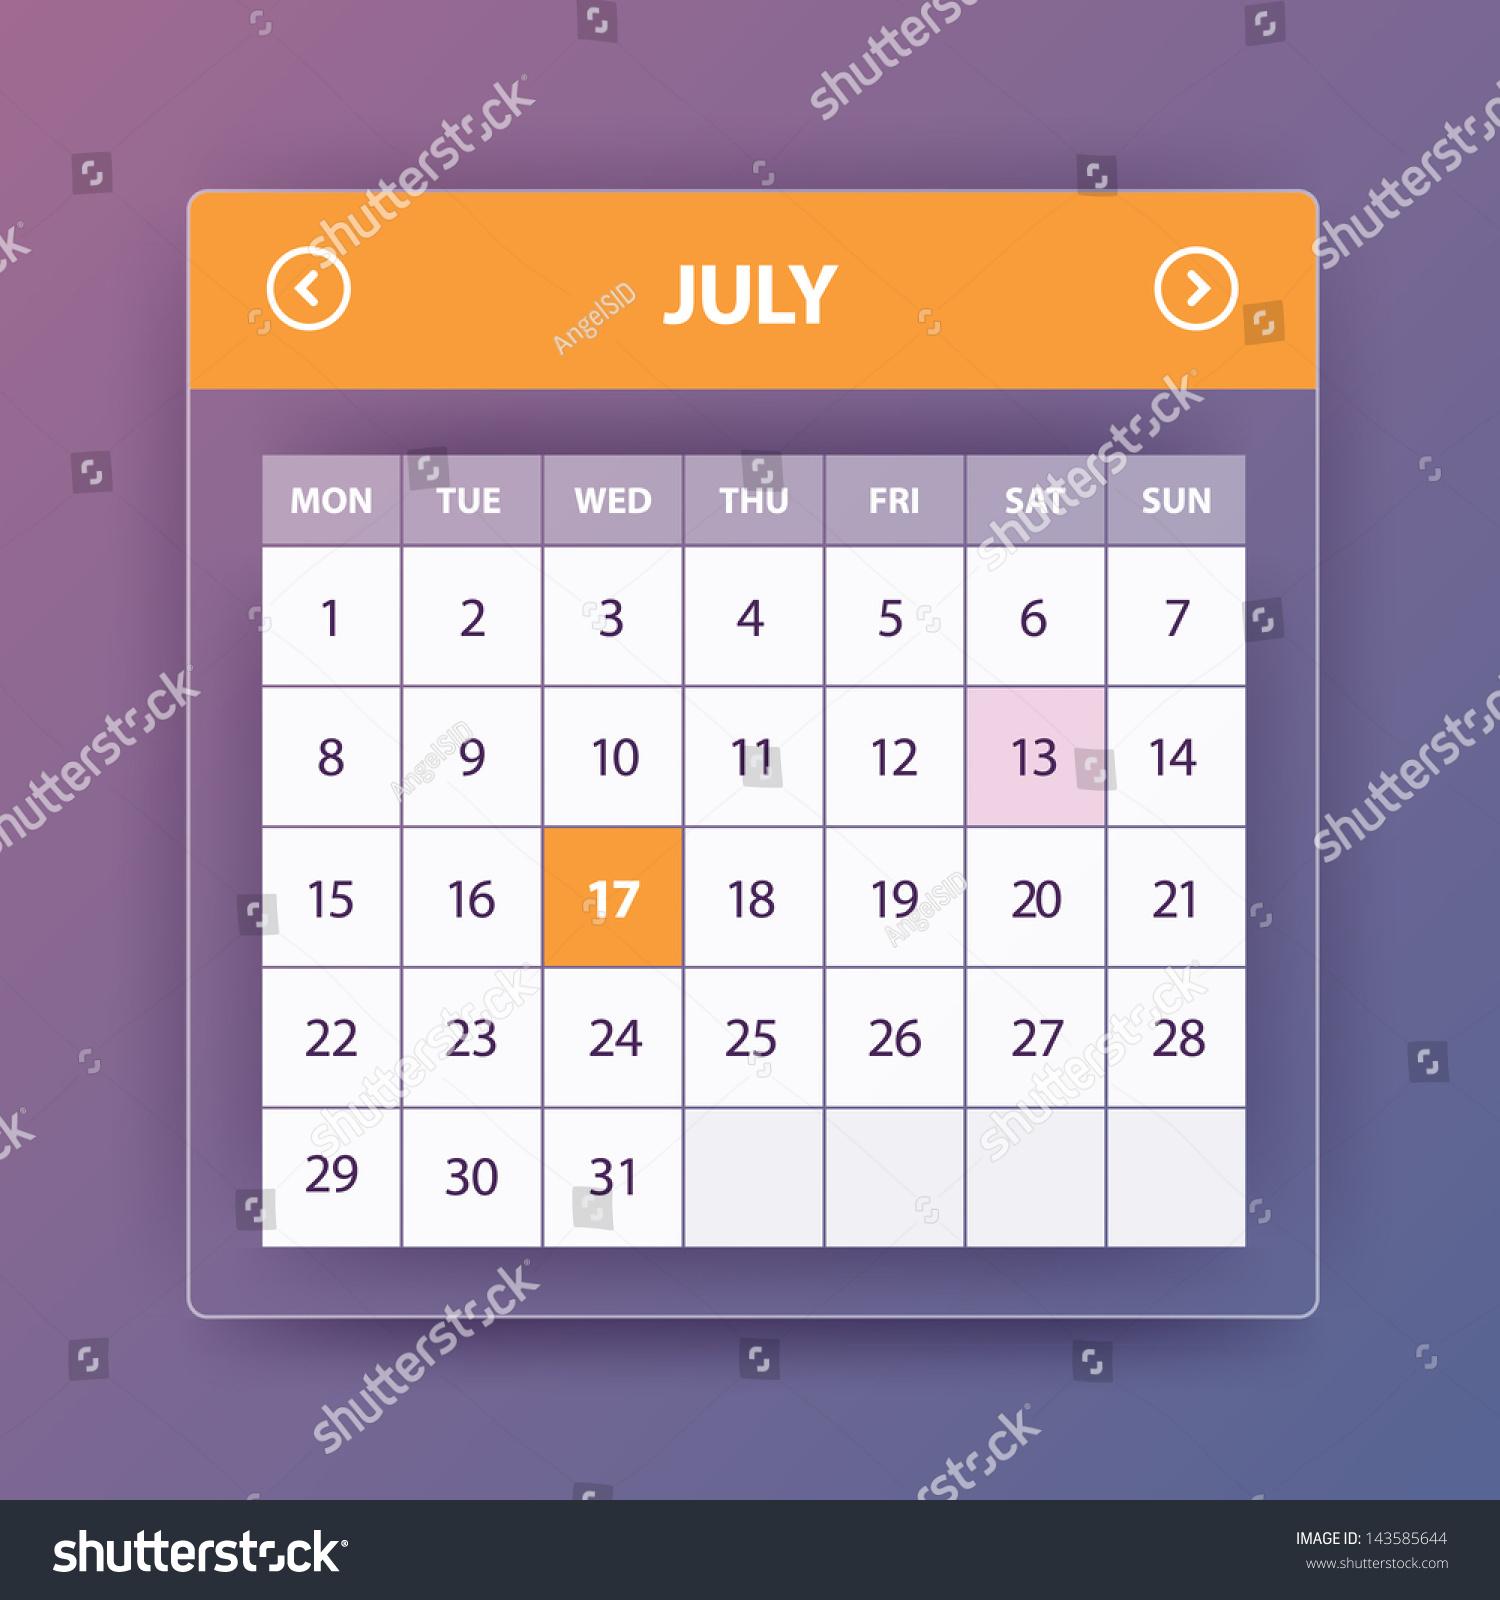 Calendar Flat Illustration : Calendar flat stock vector illustration